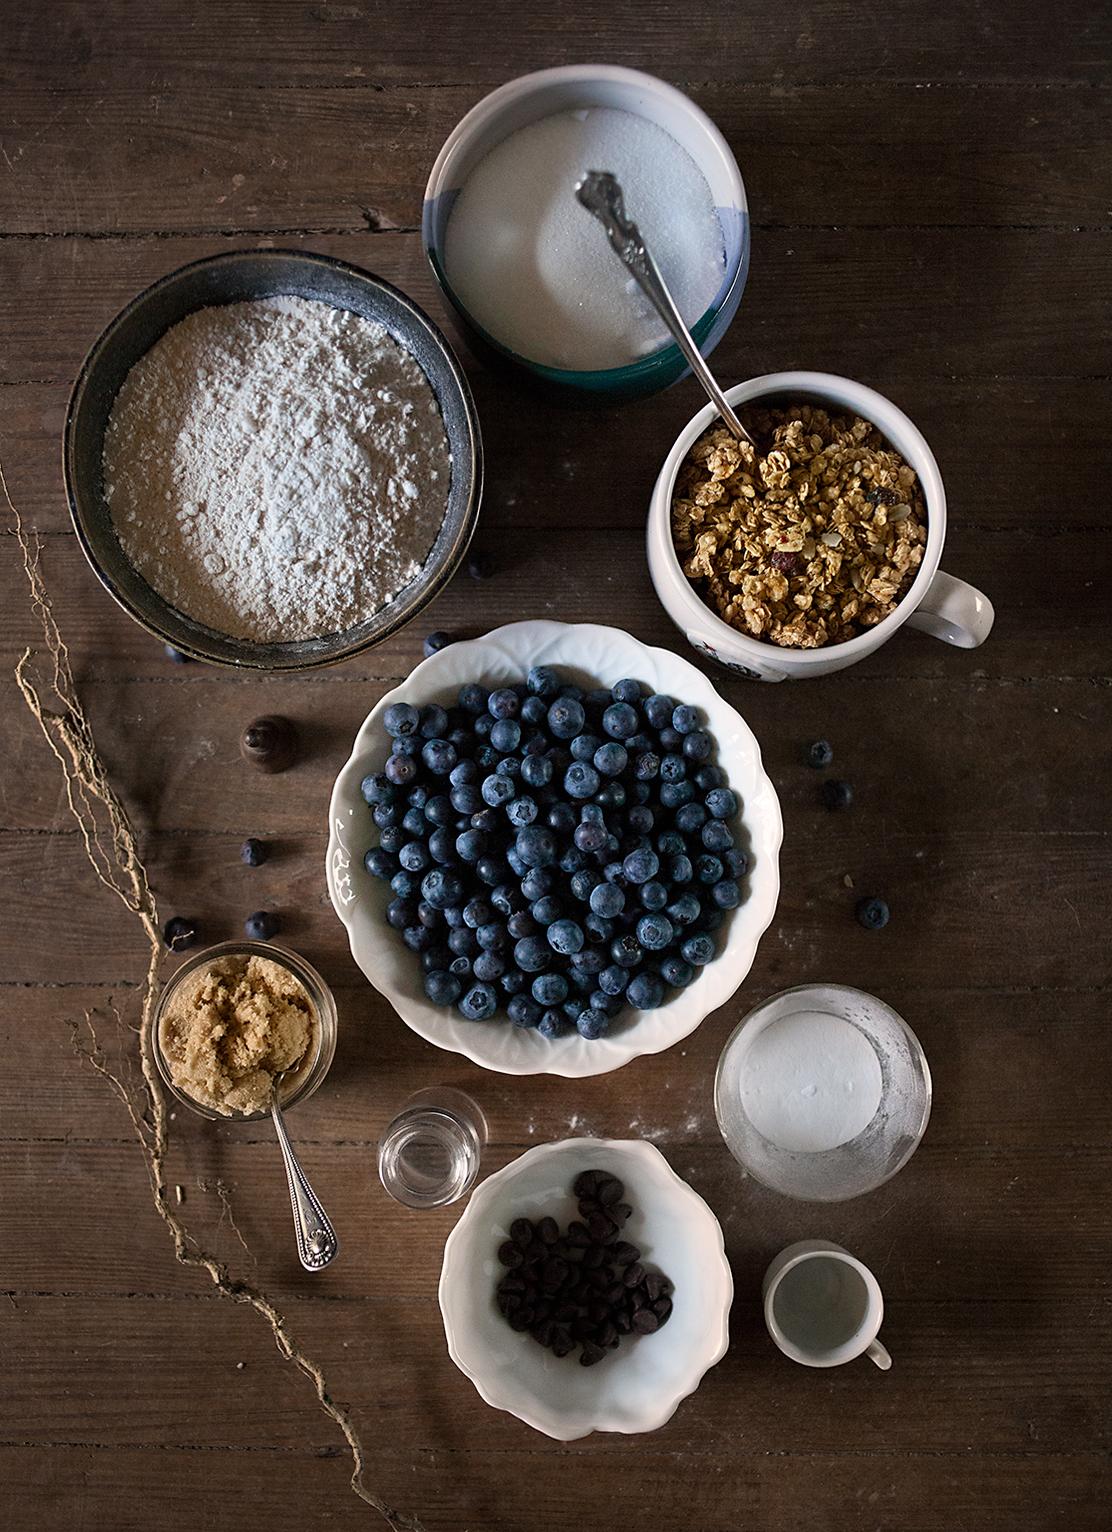 Dry Ingredients for Blueberry Breakfast Bake